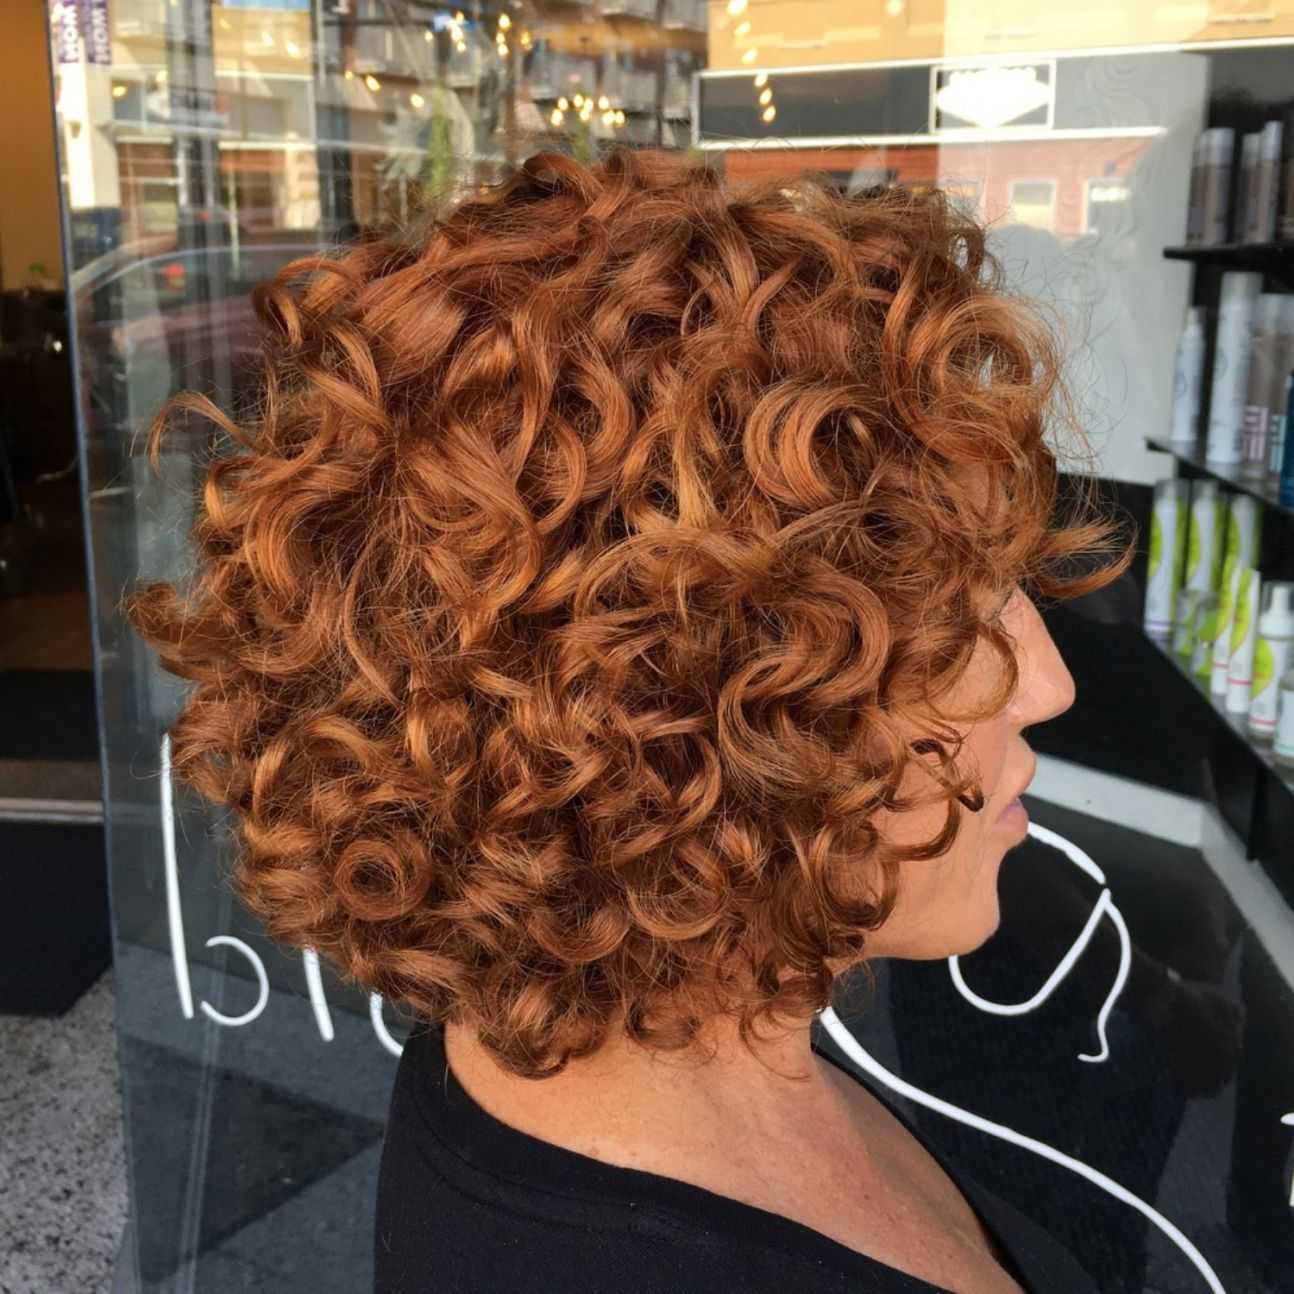 Short Curly Copper Red Bob Bob Kapsel Krullen Kapsel Voor Krullend Haar Kort Haar Krullen